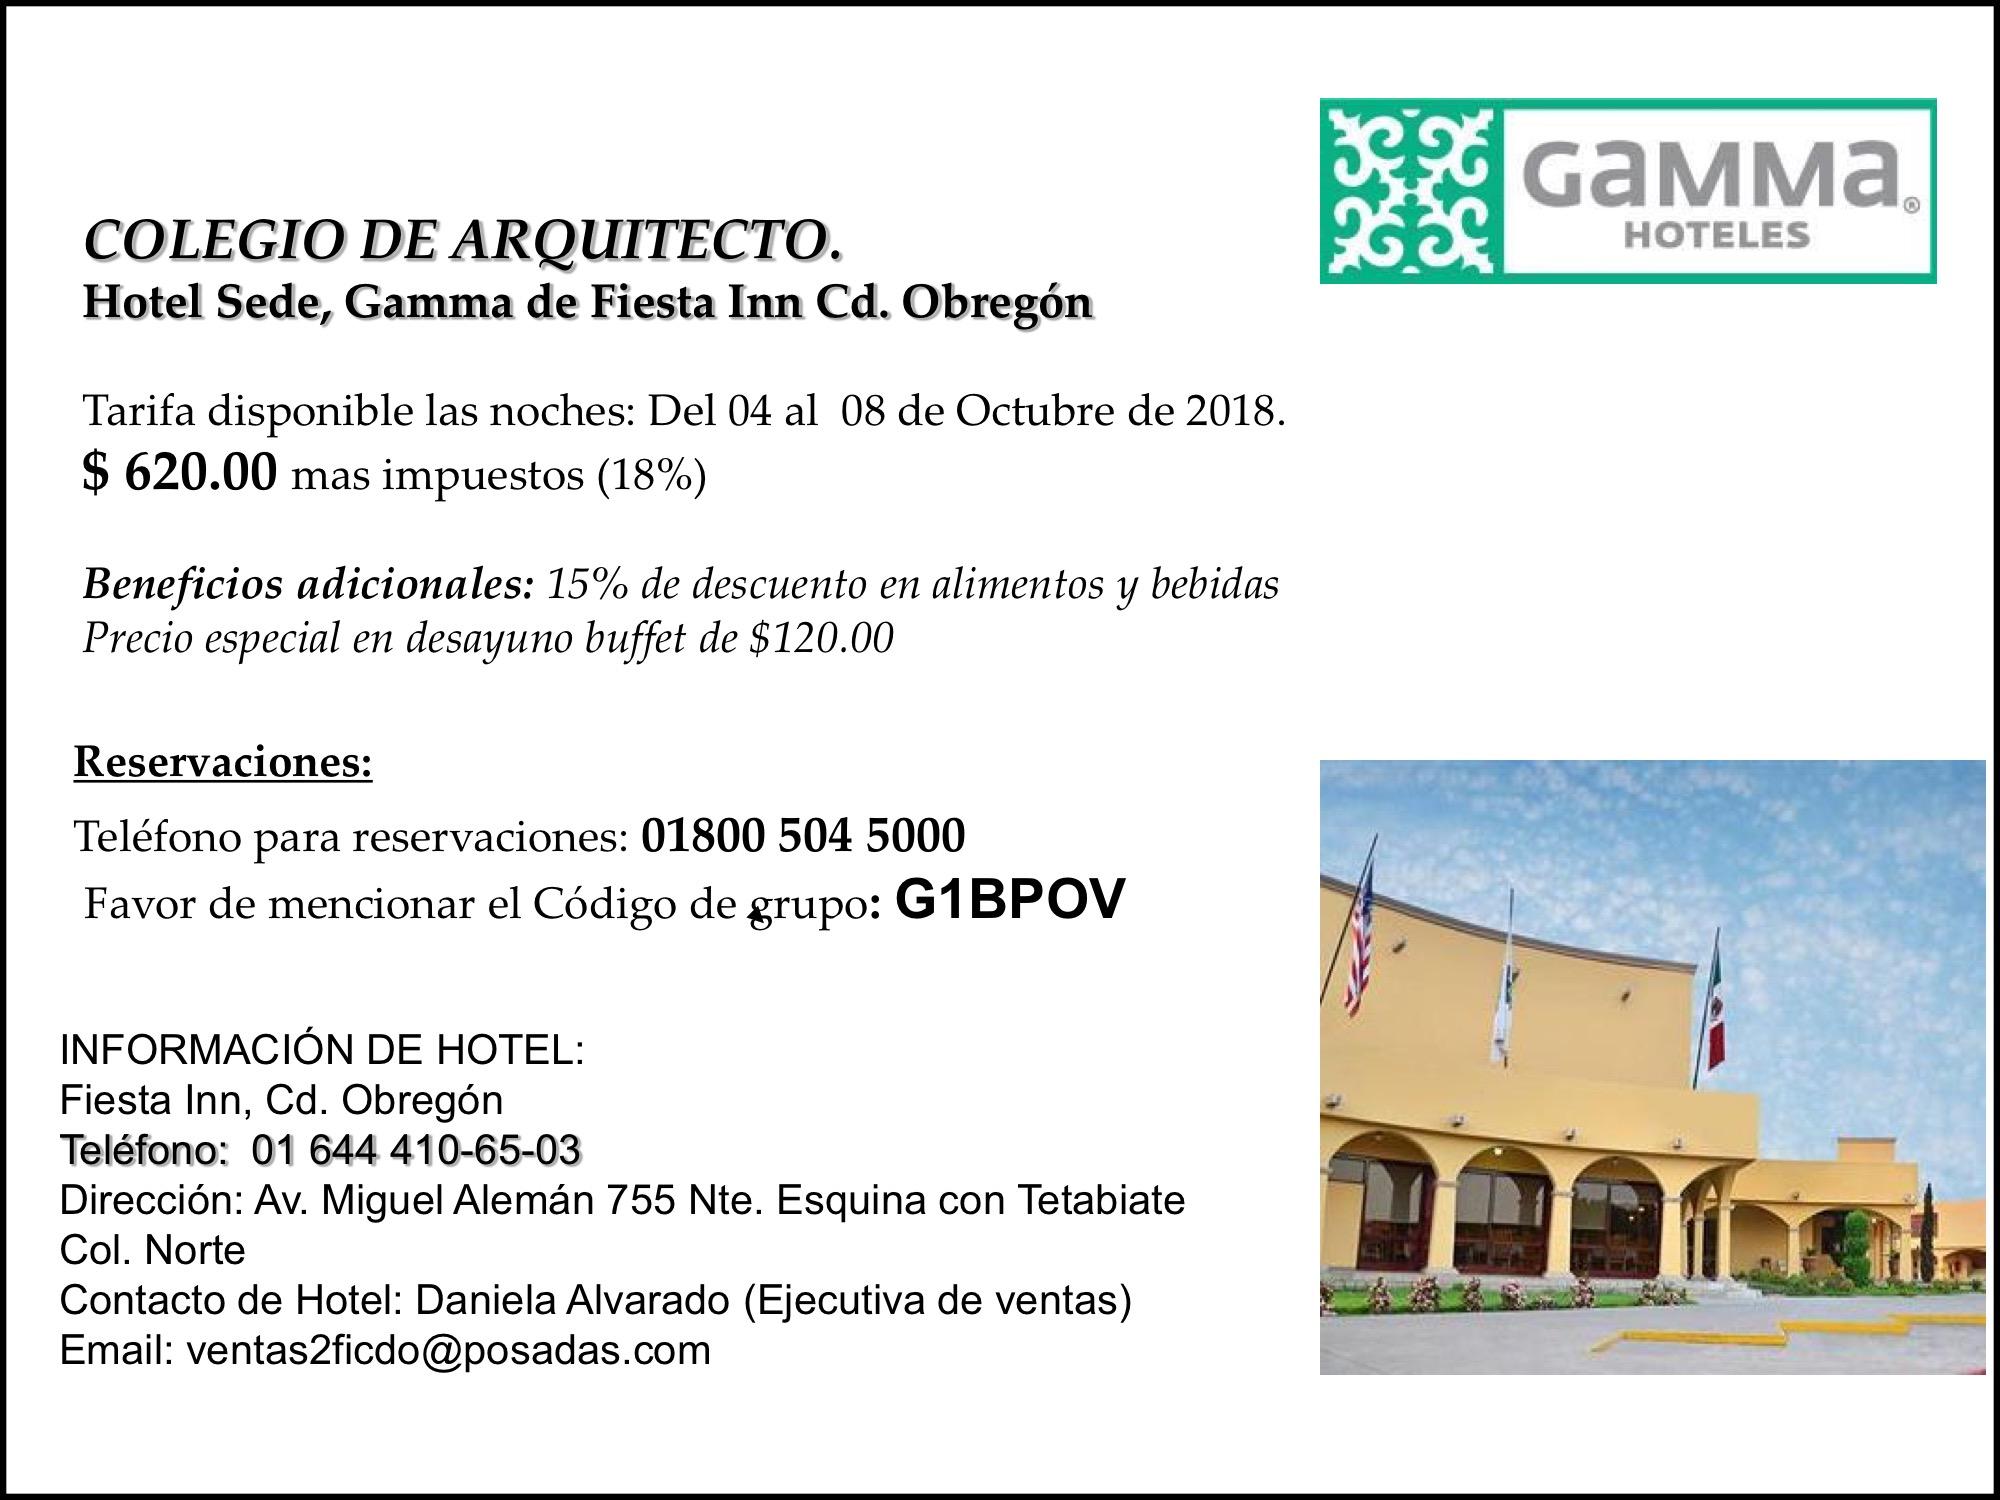 CODIGO GAMMA COLEGIO DE ARQUITECTO.jpeg